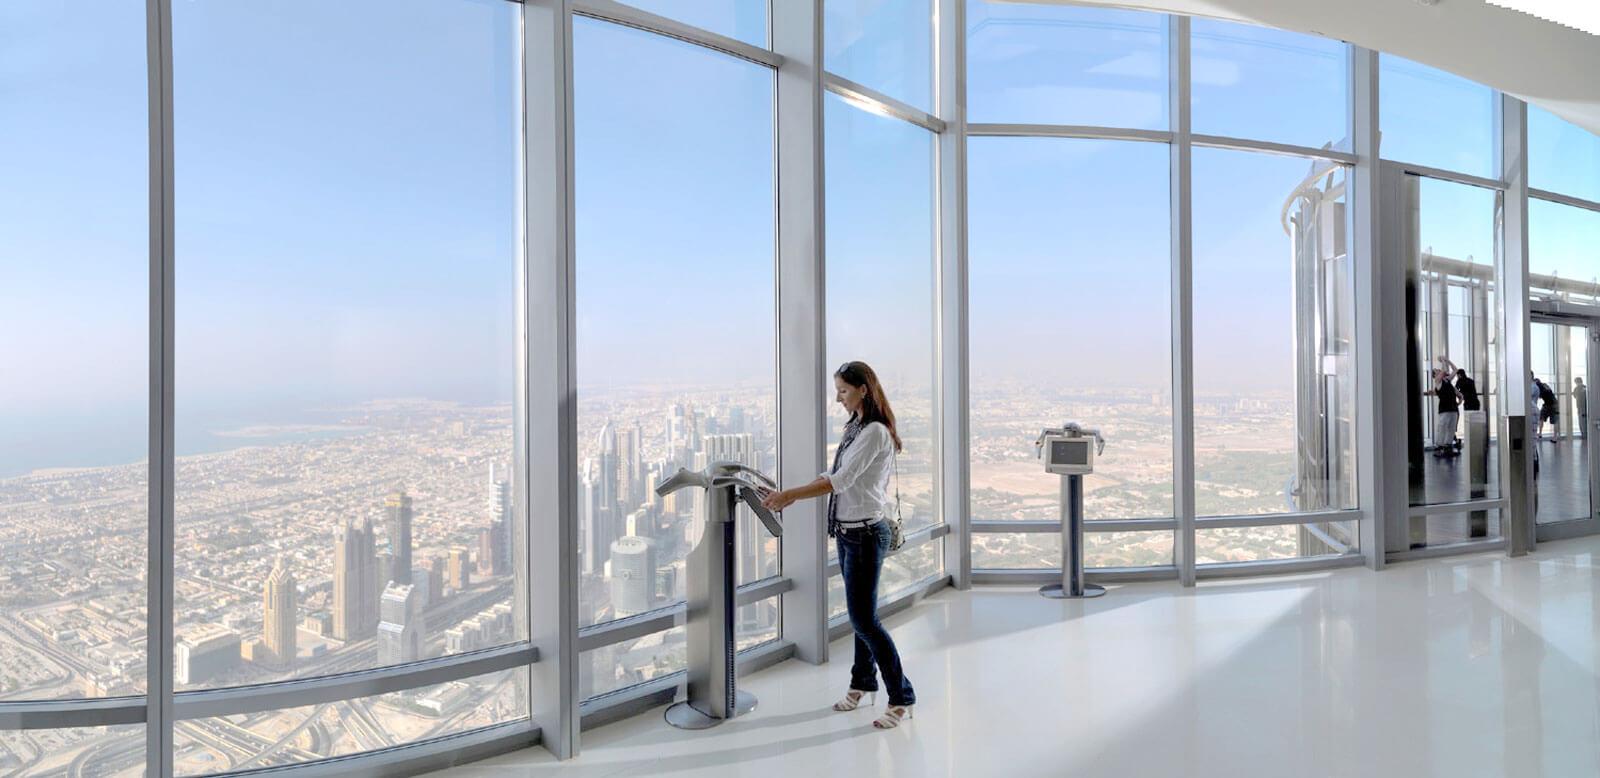 At The Top, Бурдж Халифа